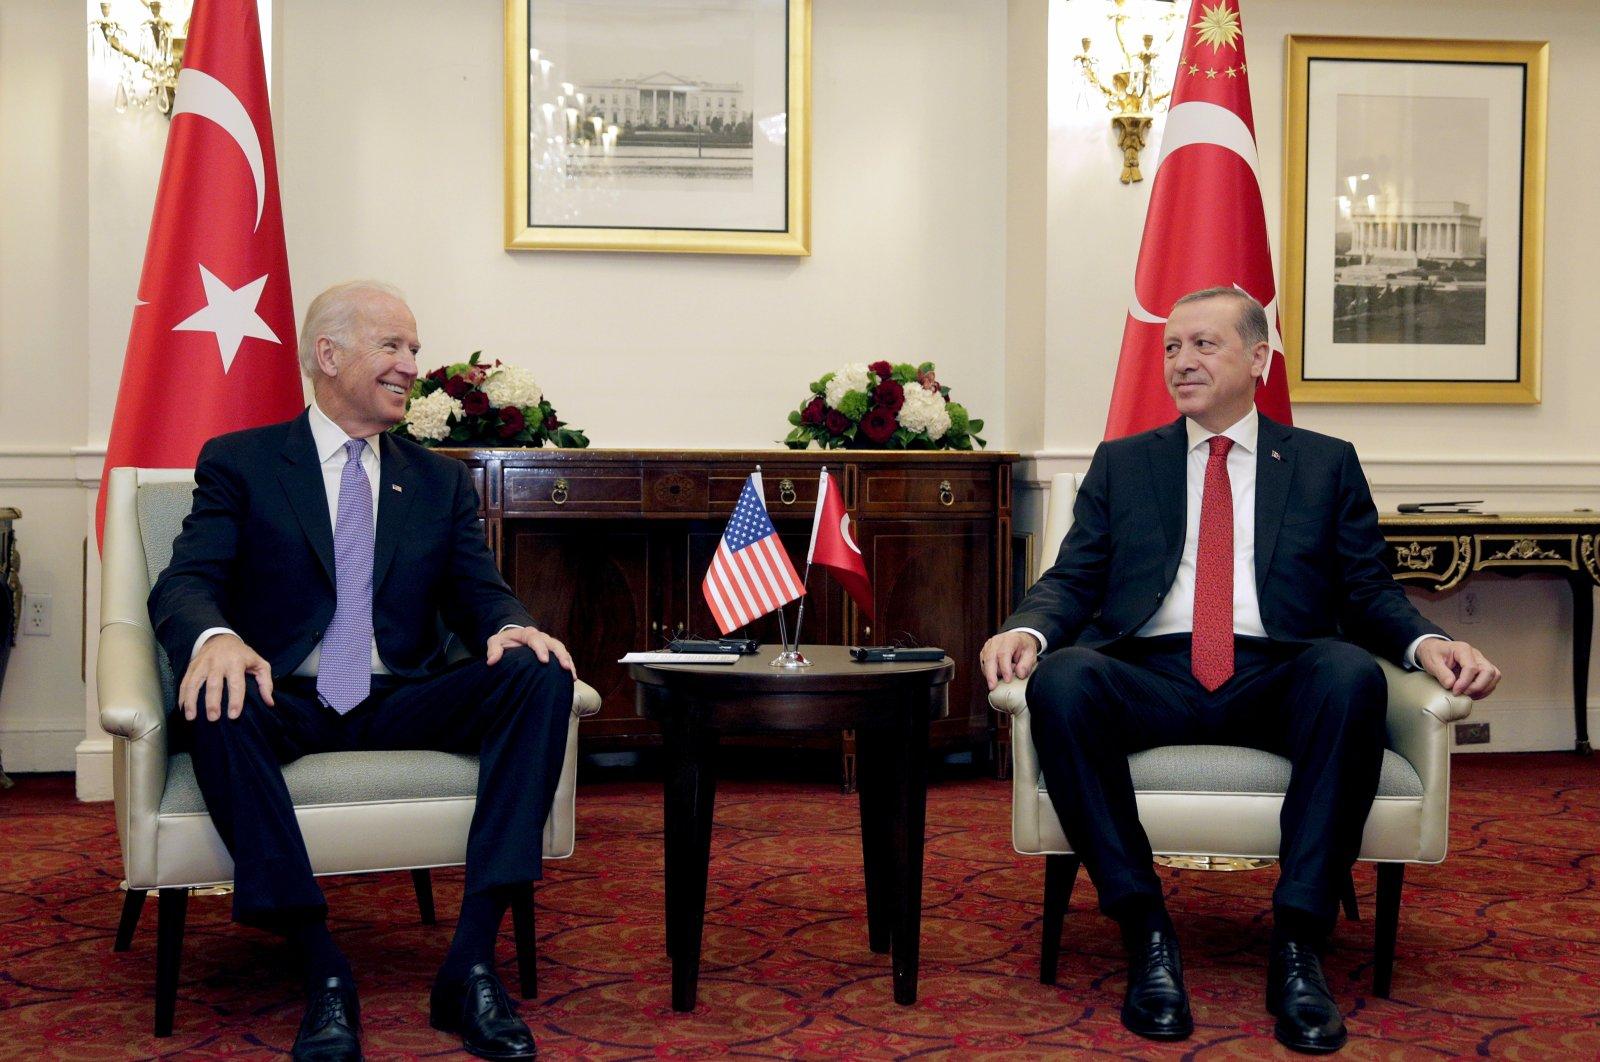 President Recep Tayyip Erdoğan (R) and then-U.S. Vice President Joe Biden (L) attend a bilateral meeting in Washington, U.S., March 31, 2016. (Reuters Photo)